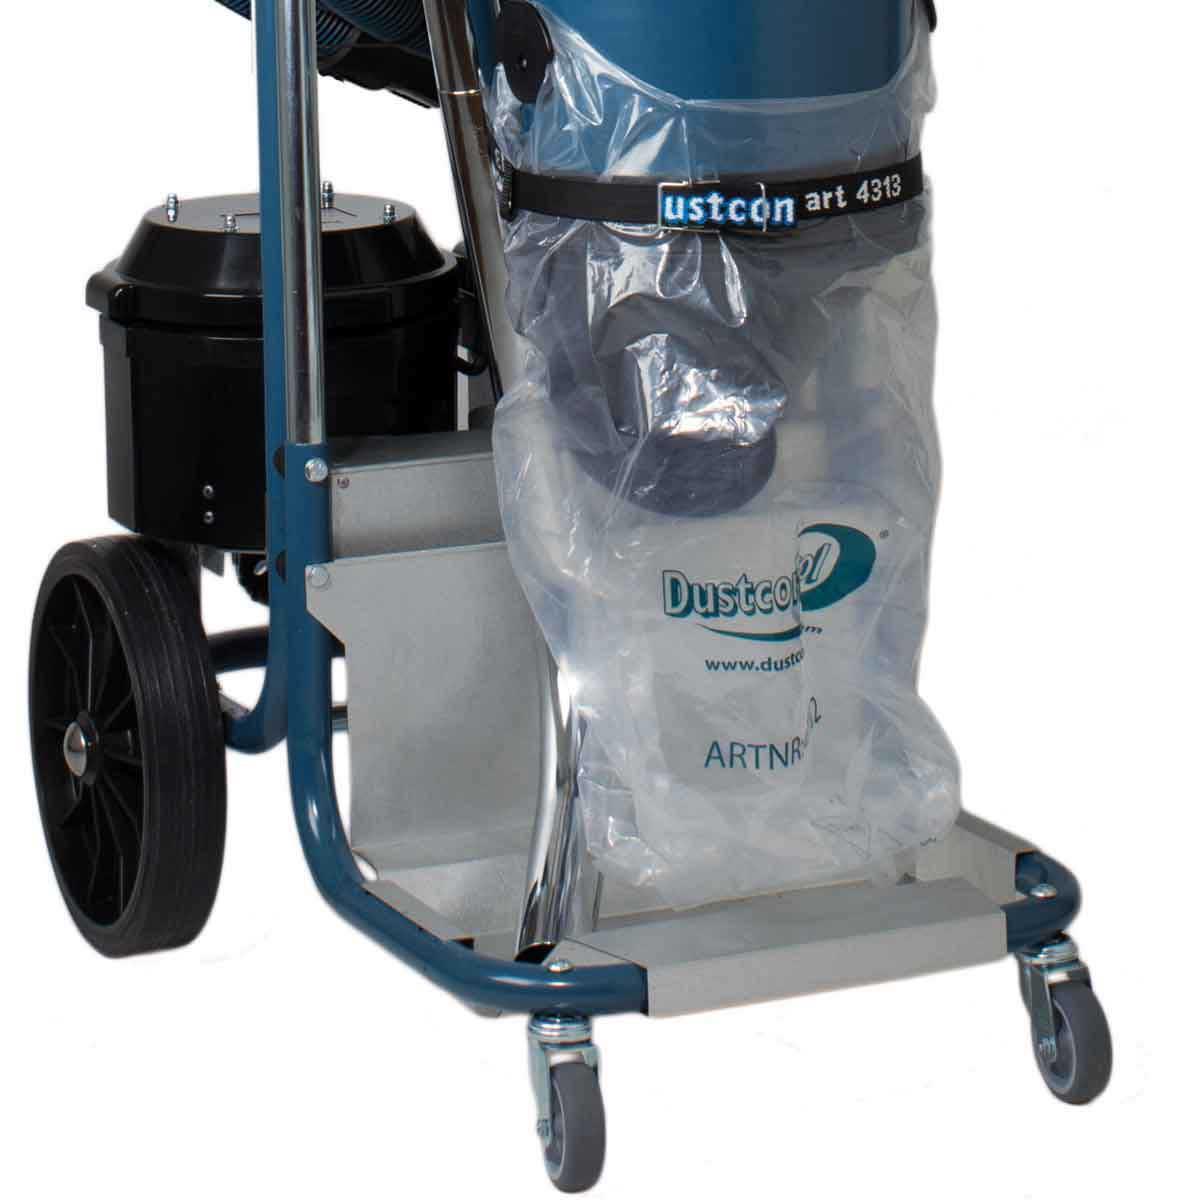 DustControl DC 3900c plastic bags